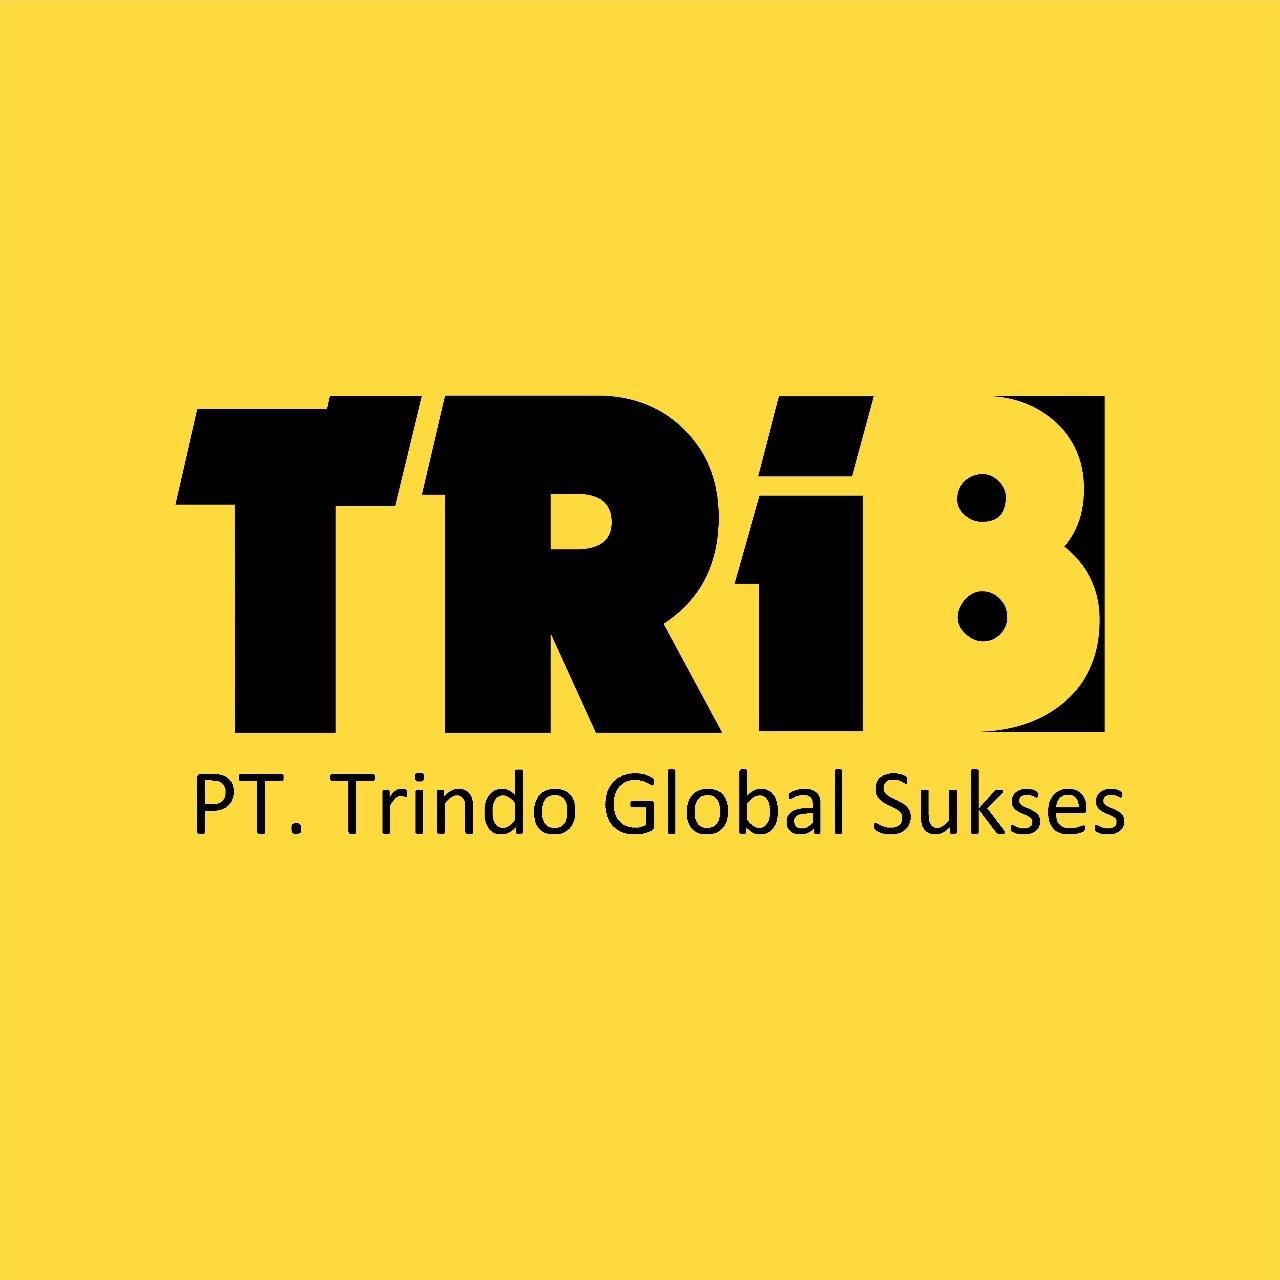 Trindo Global Sukses